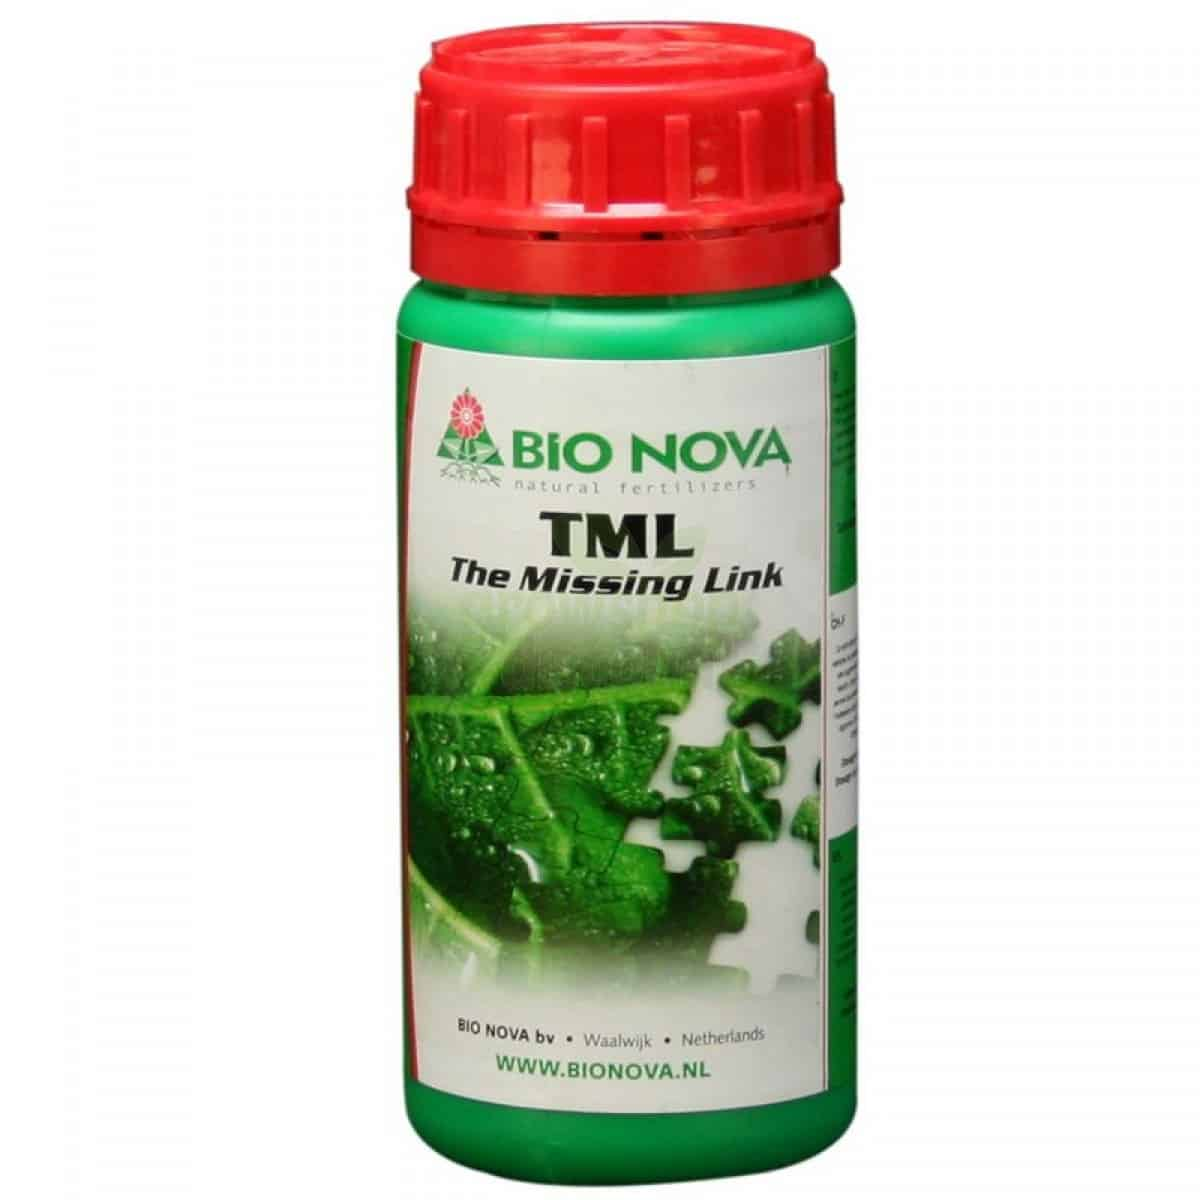 BIONOVA - TML - THE MISSING LINK